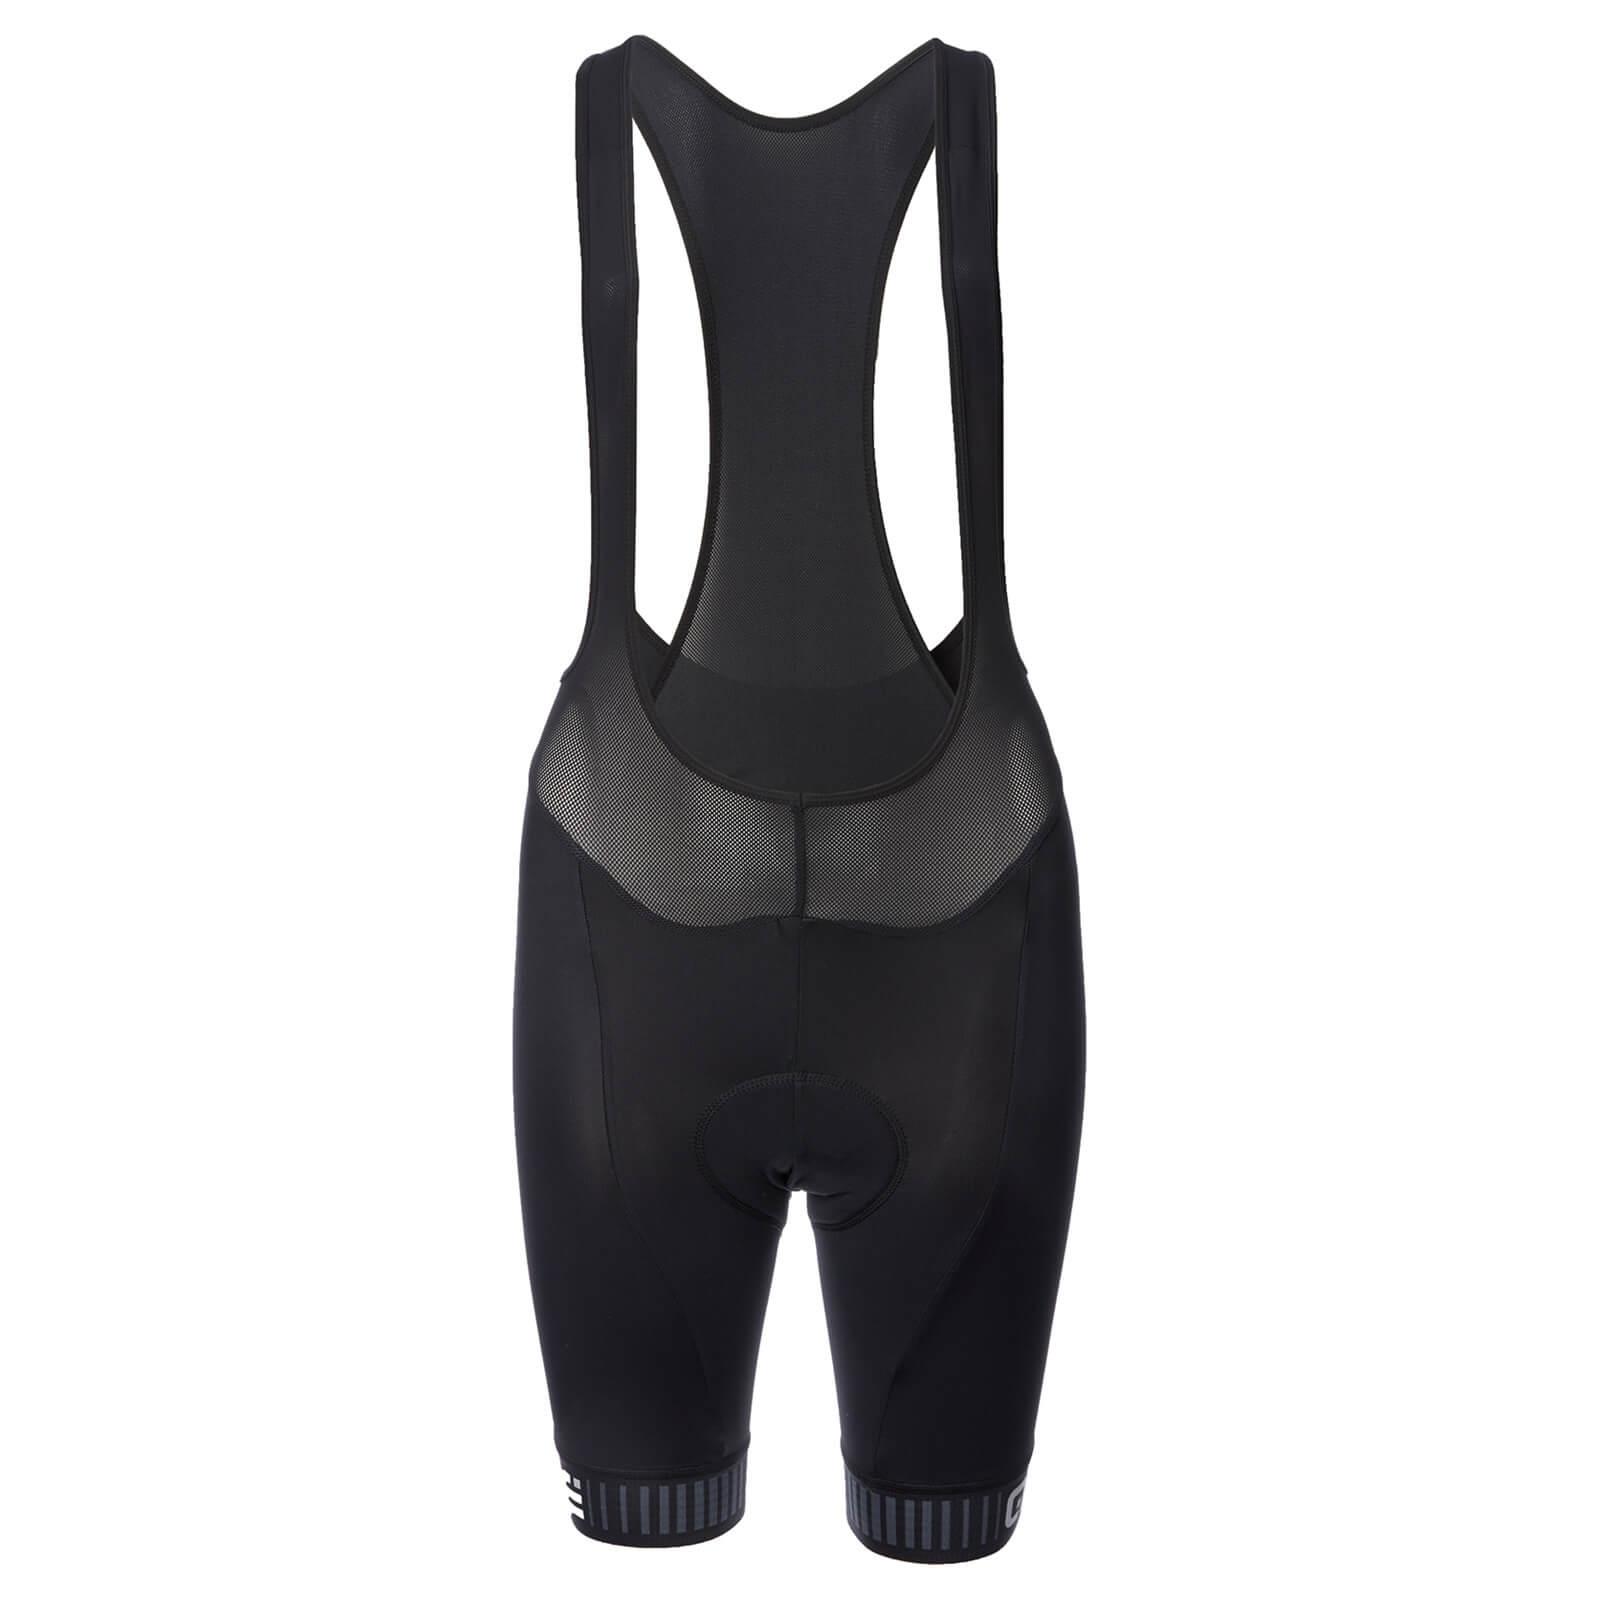 Alé Women's Solid Traguardo Bib Shorts - S - Black